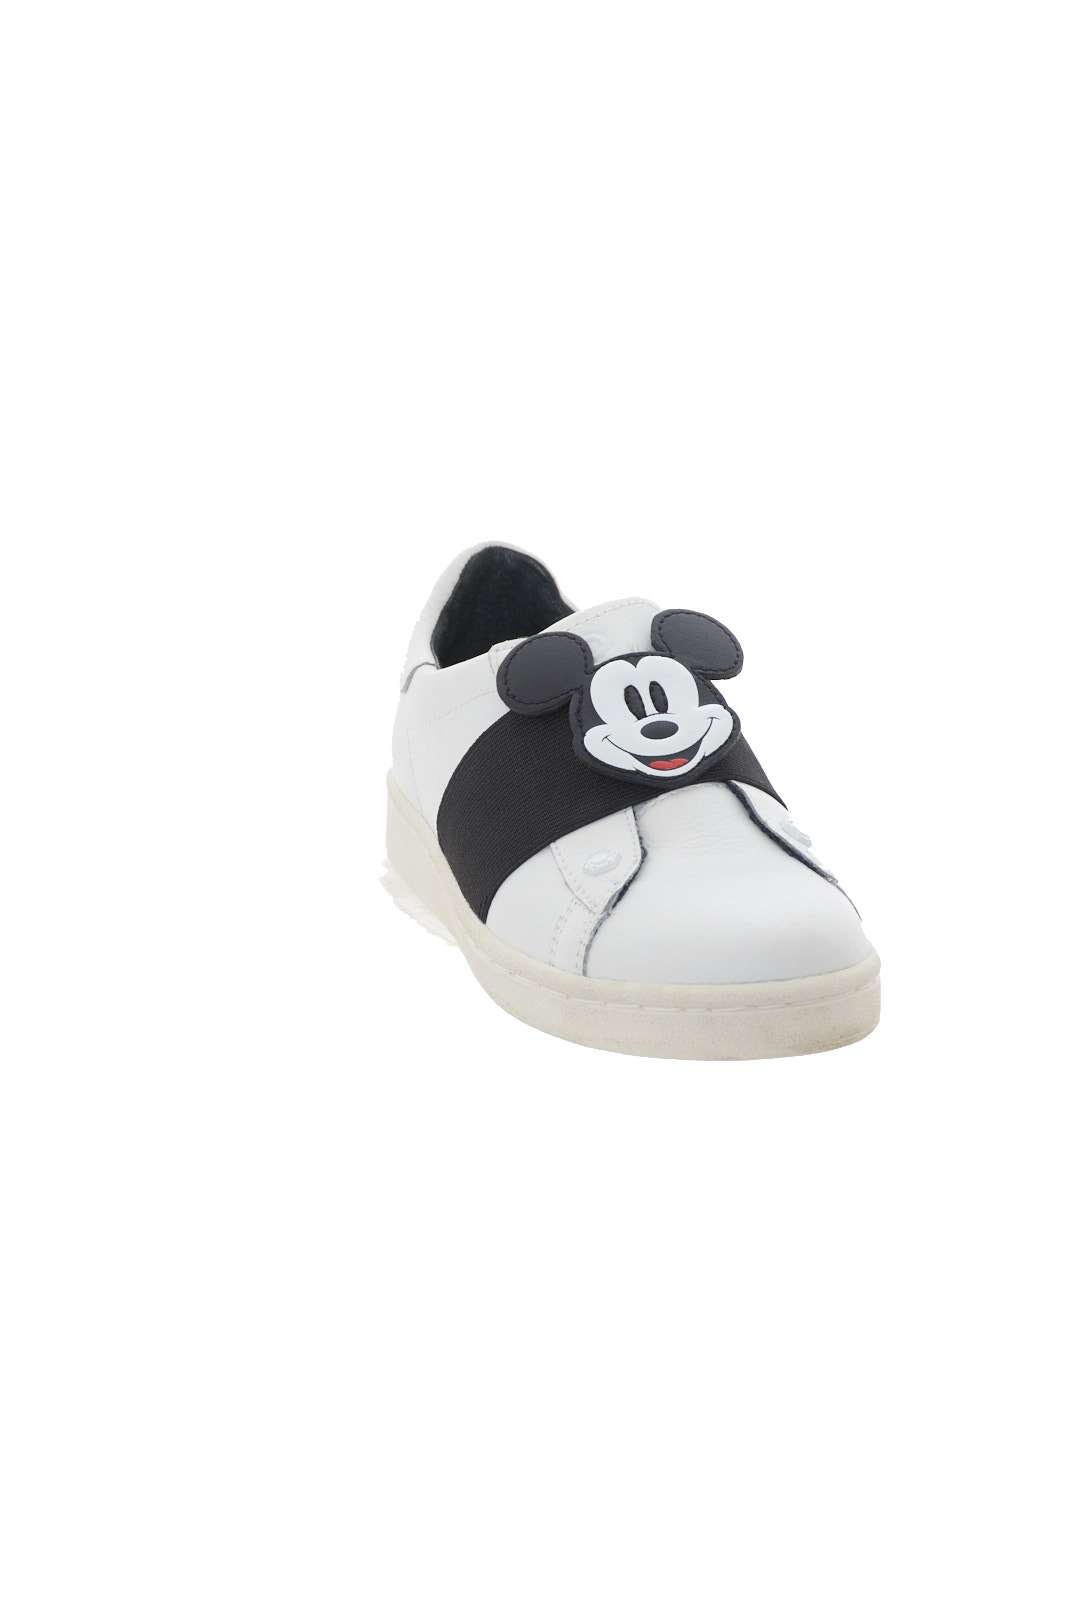 /media/catalog/product/P/E/PE-outlet_parmxa-sneaker-MOaConcept-mdj48-C.jpg